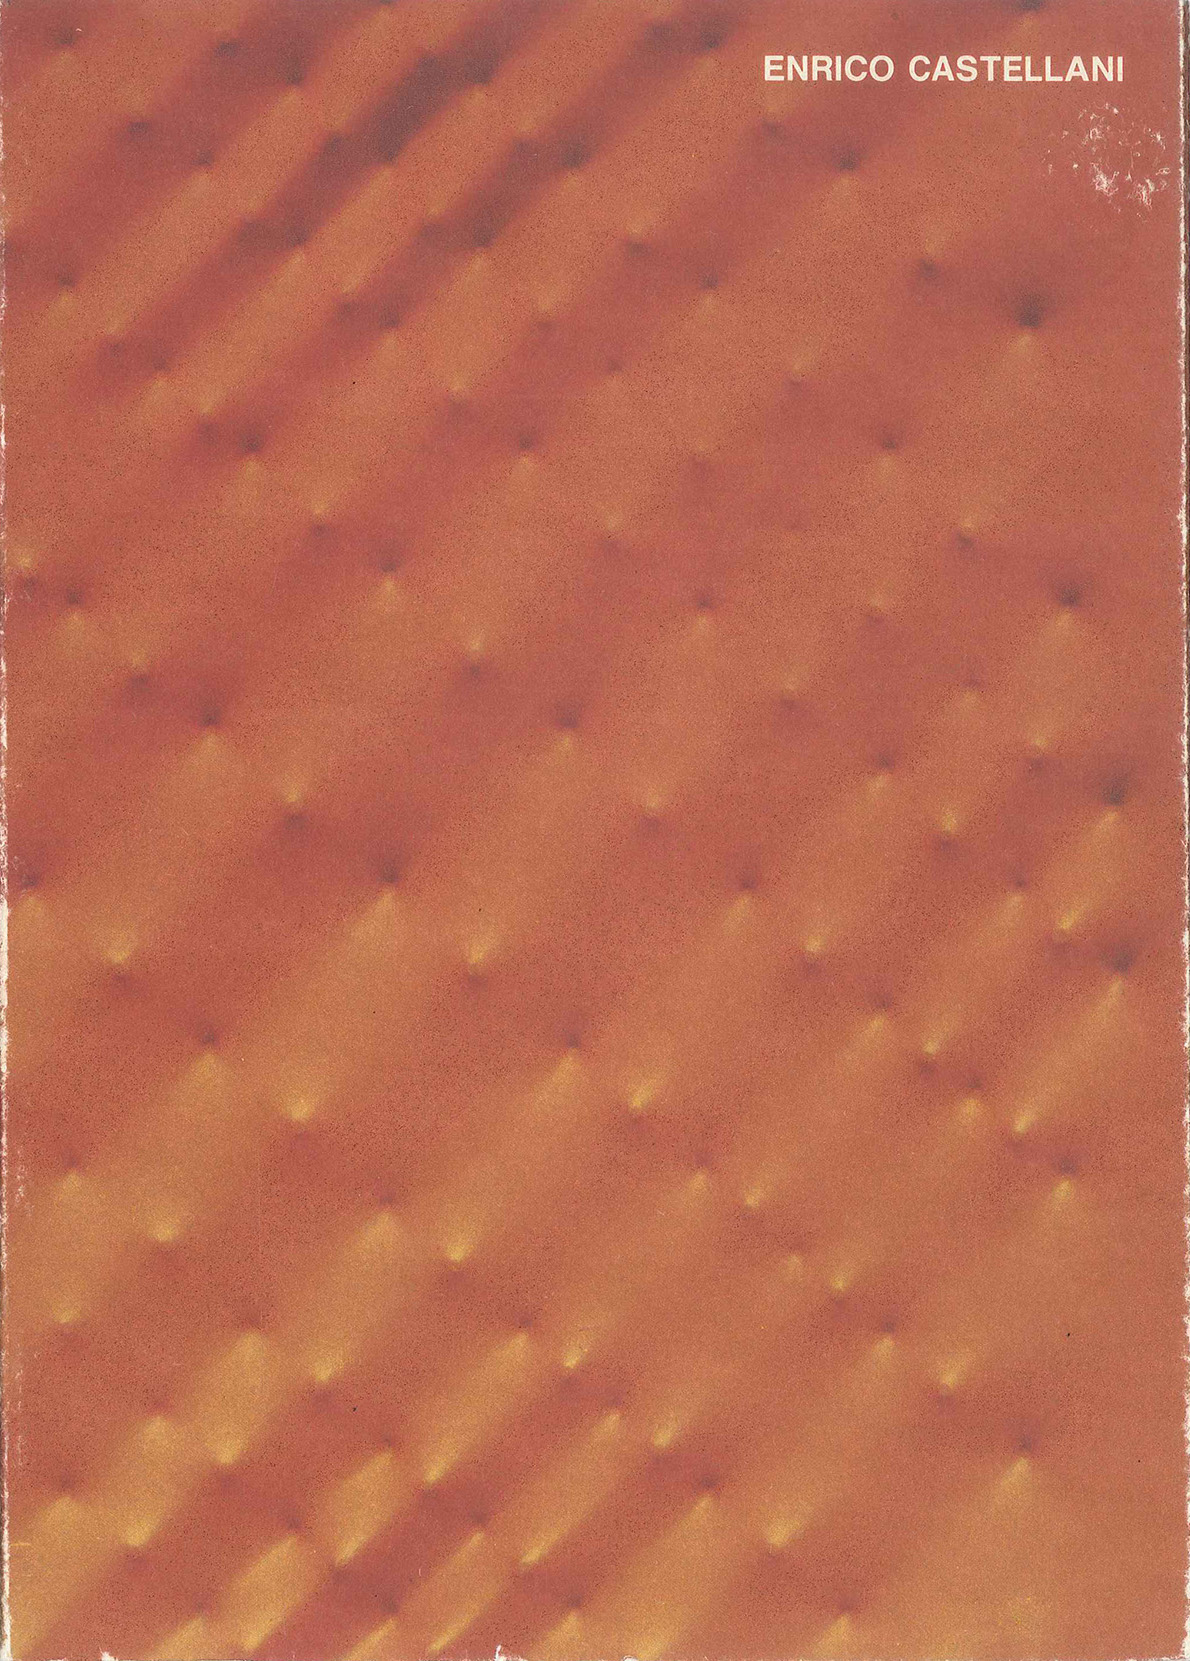 Cover - Enrico Castellani, Elena Pontiggia, 1989, Artevalente, Finale Ligure (SV)